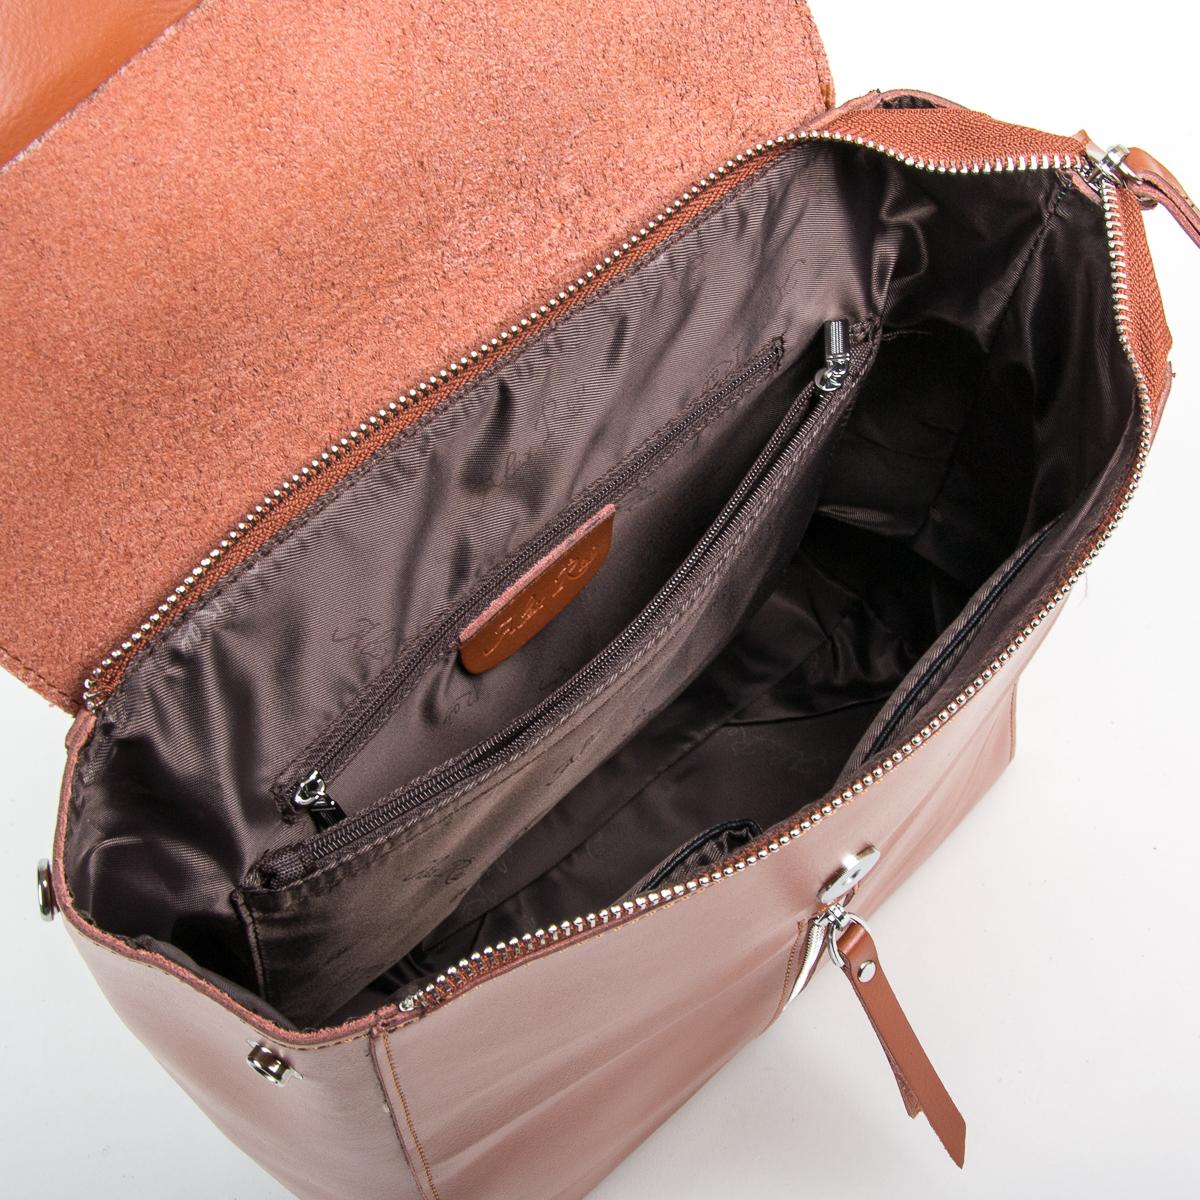 Сумка Женская Рюкзак кожа ALEX RAI 9-01 373 khaki - фото 5